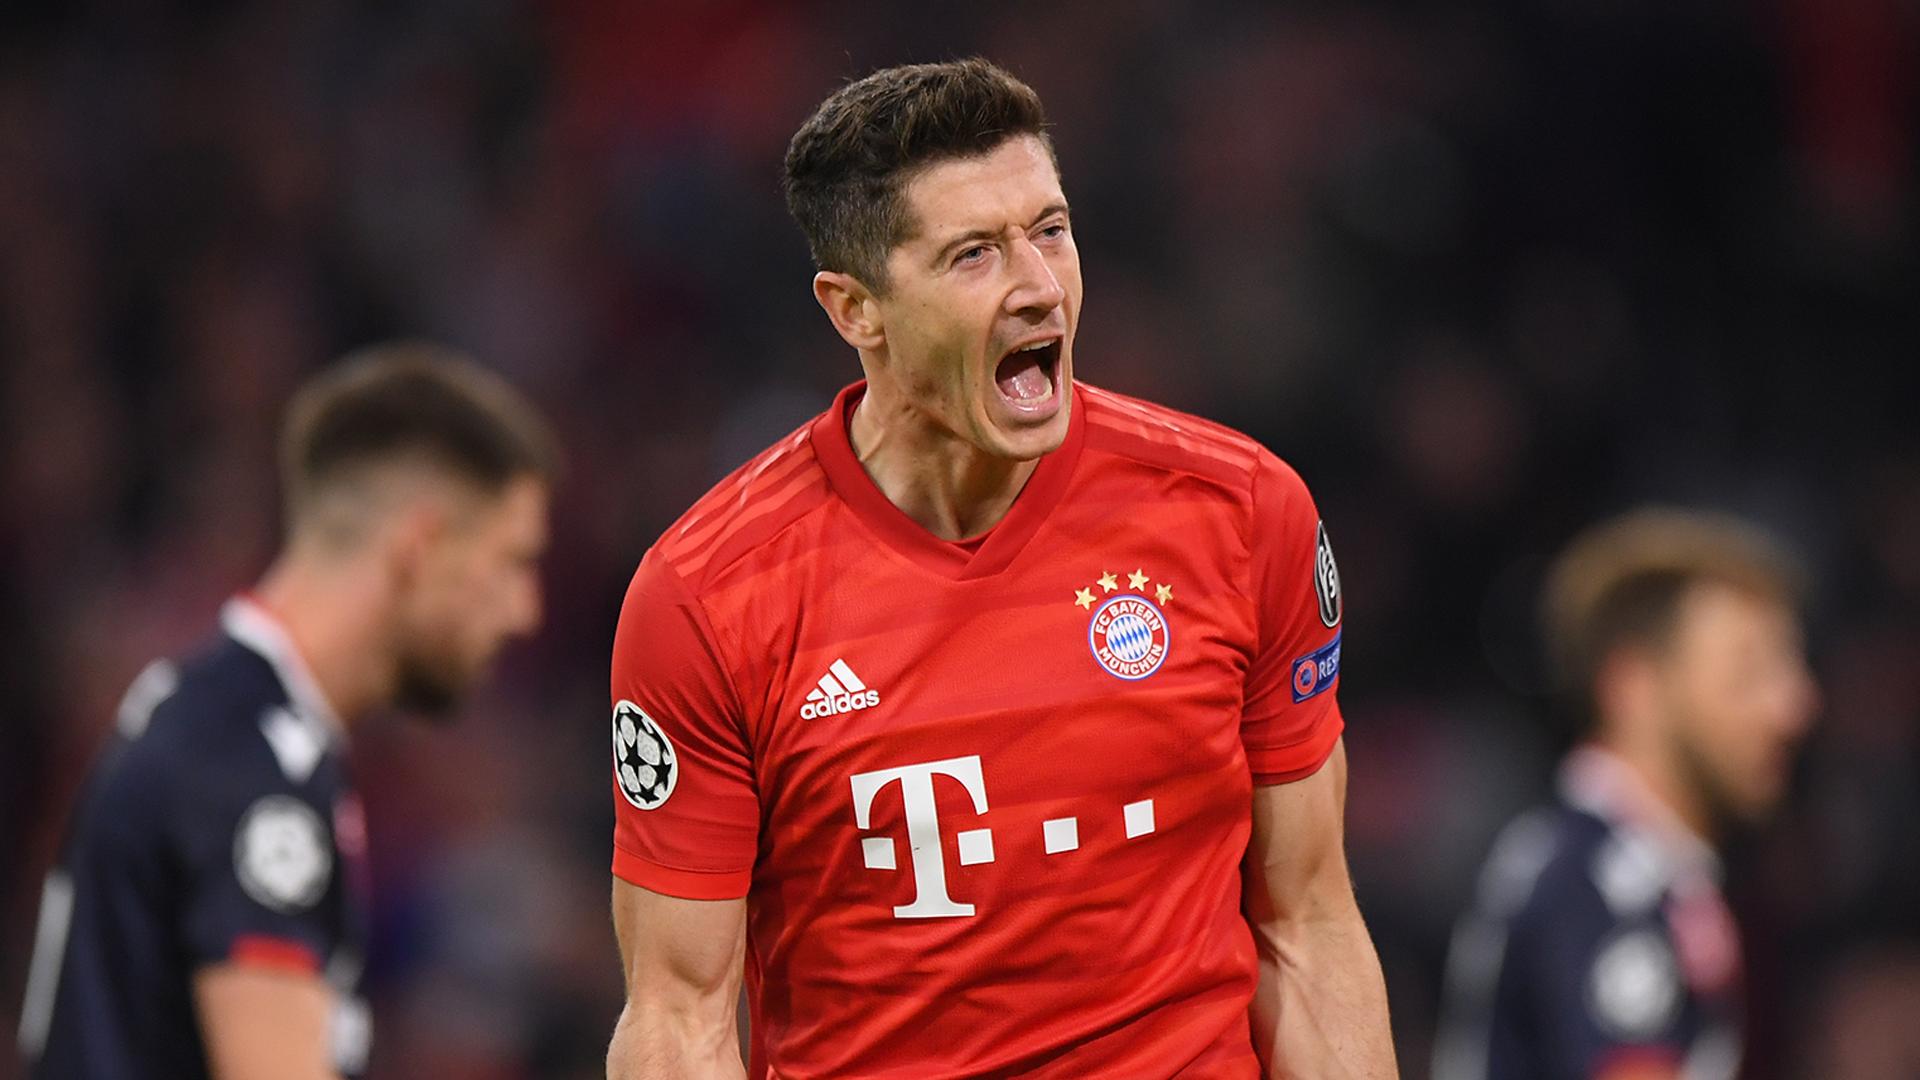 Bayern striker Lewandowski needs groin surgery, says temporary boss Flick